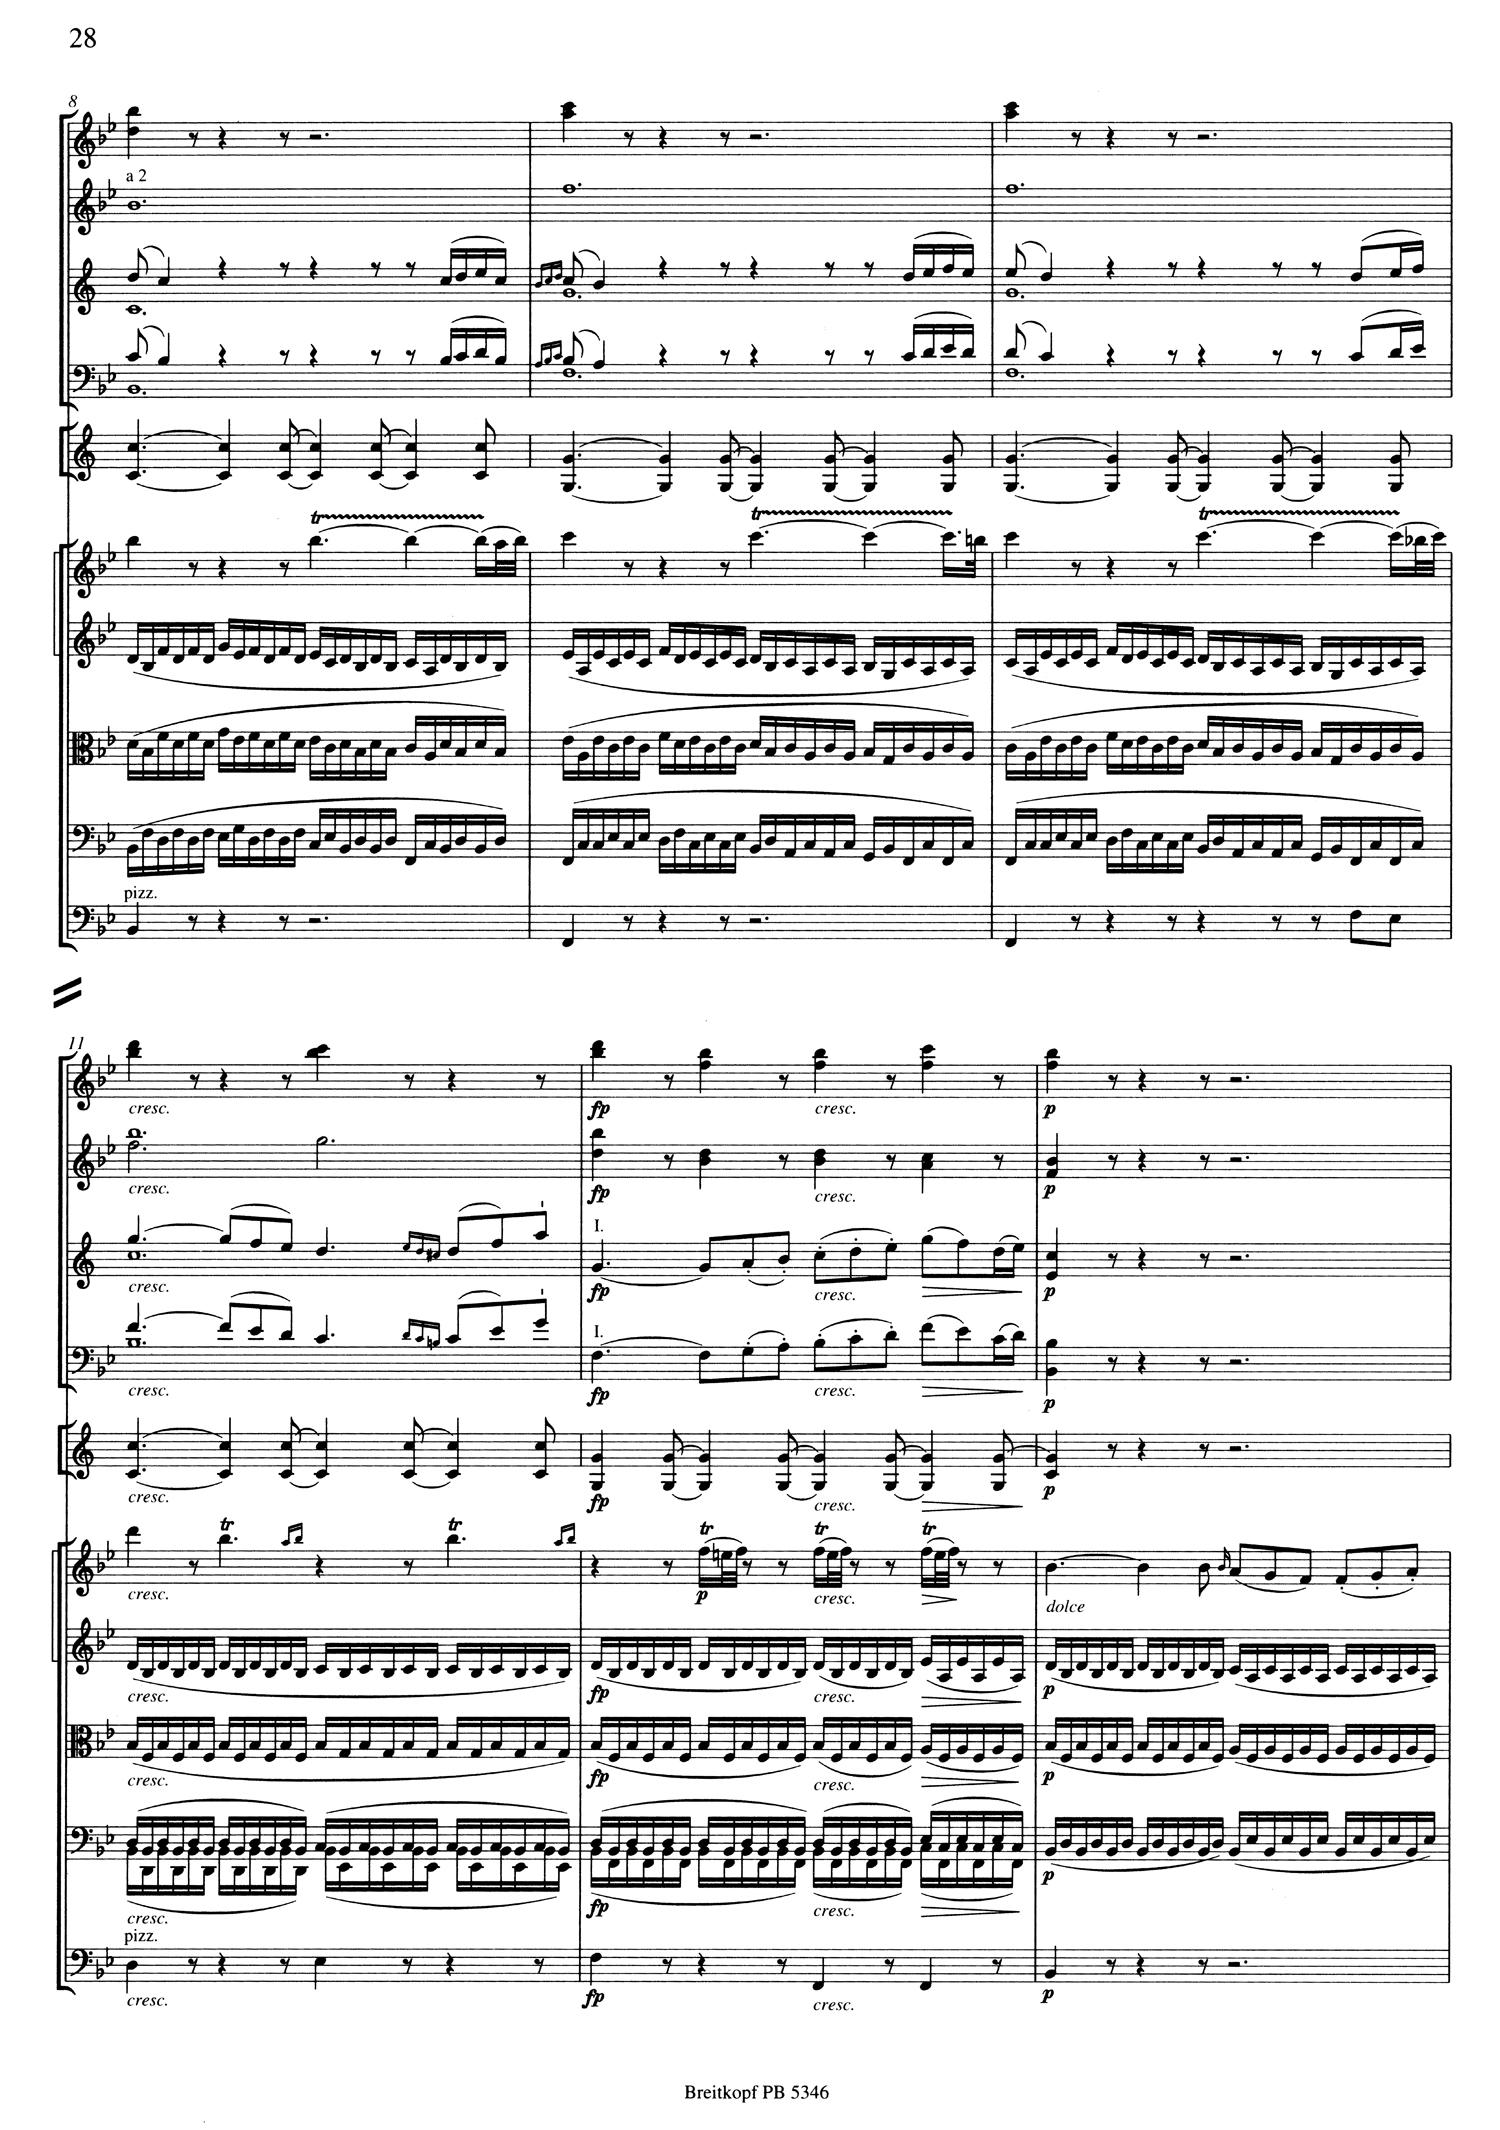 Beethoven 6 Score 4.jpg